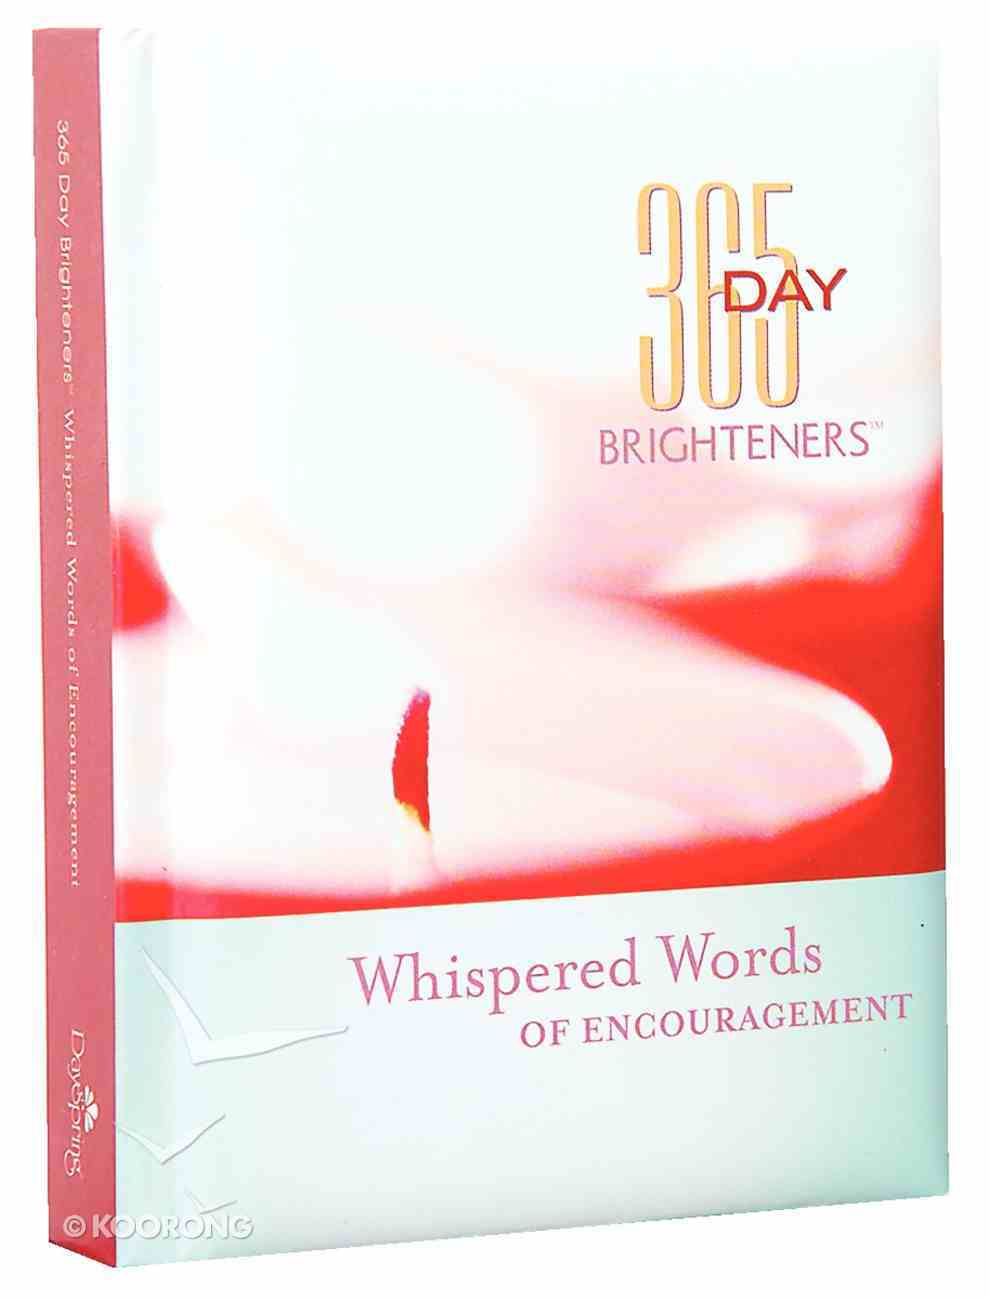 Whispered Words of Encouragement (365 Day Brighteners Series) Hardback